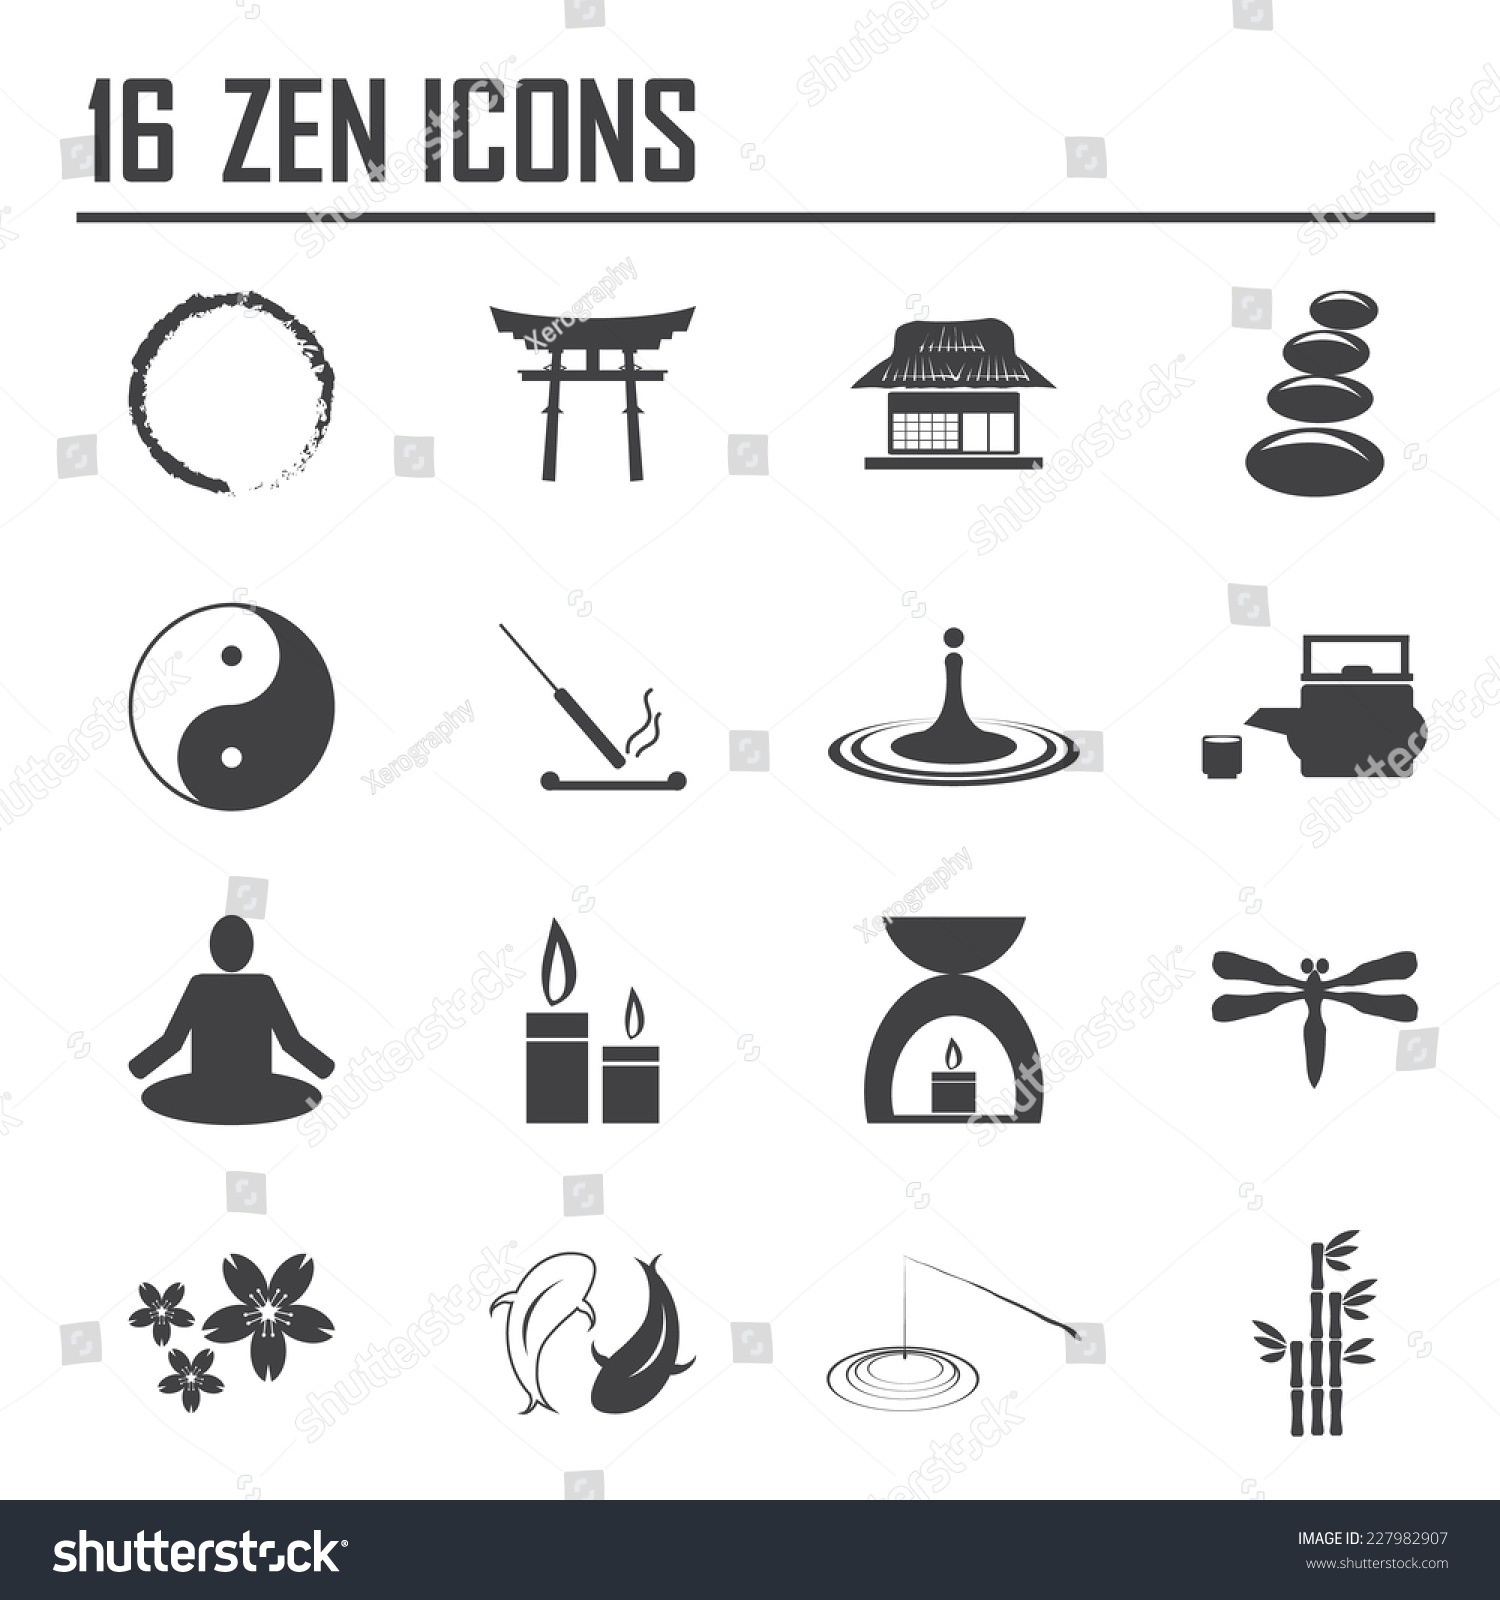 Zen Buddhist Symbols And Meanings: Zen Icons Buddhism Zen Philosophy Icon Stock Vector